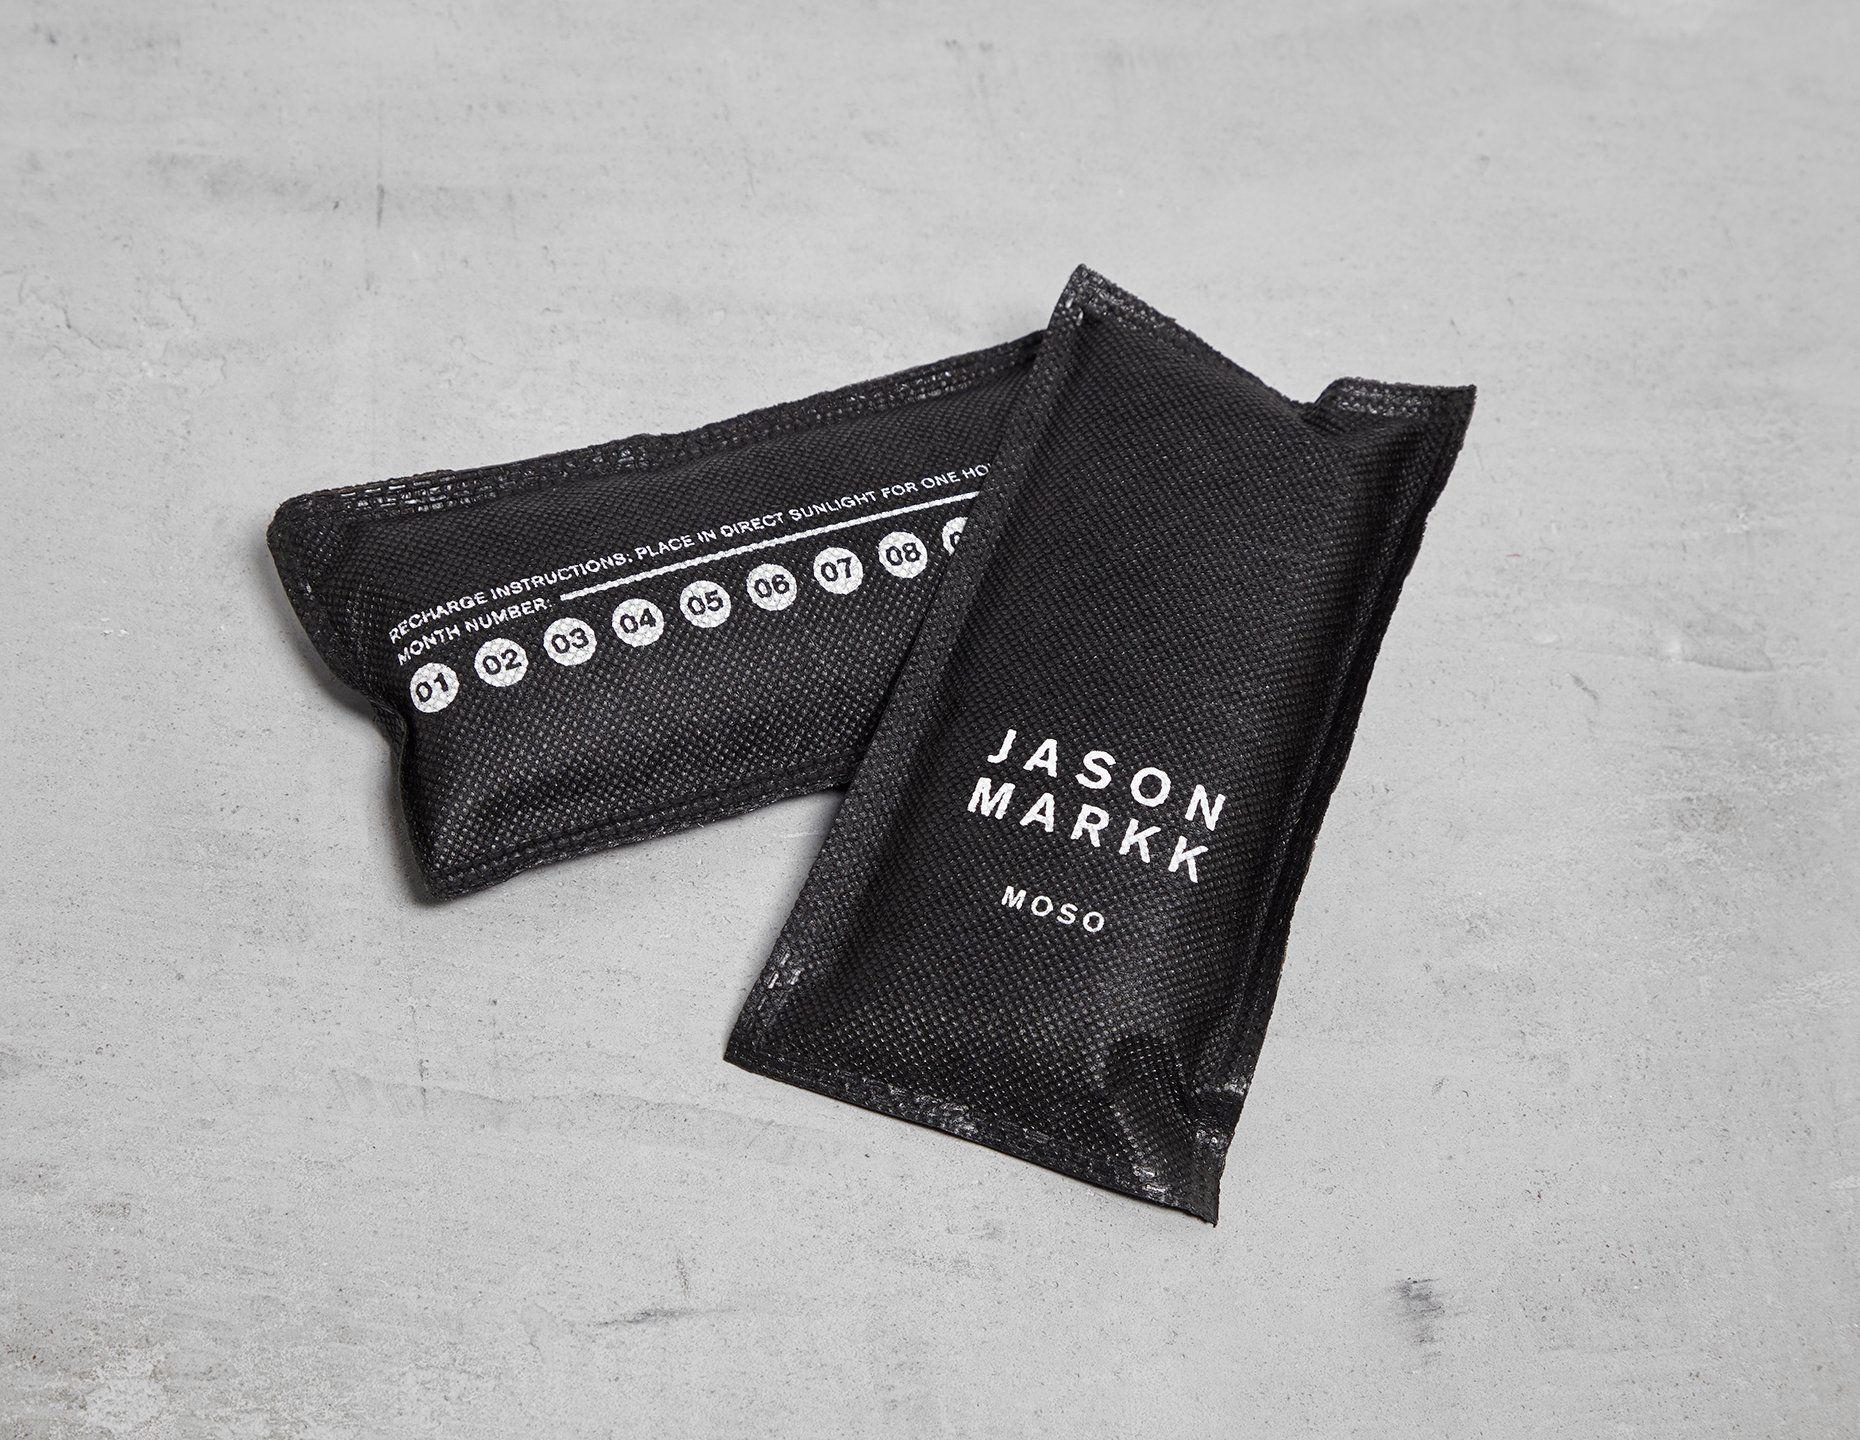 Jason Markk Moso Shoe Inserts